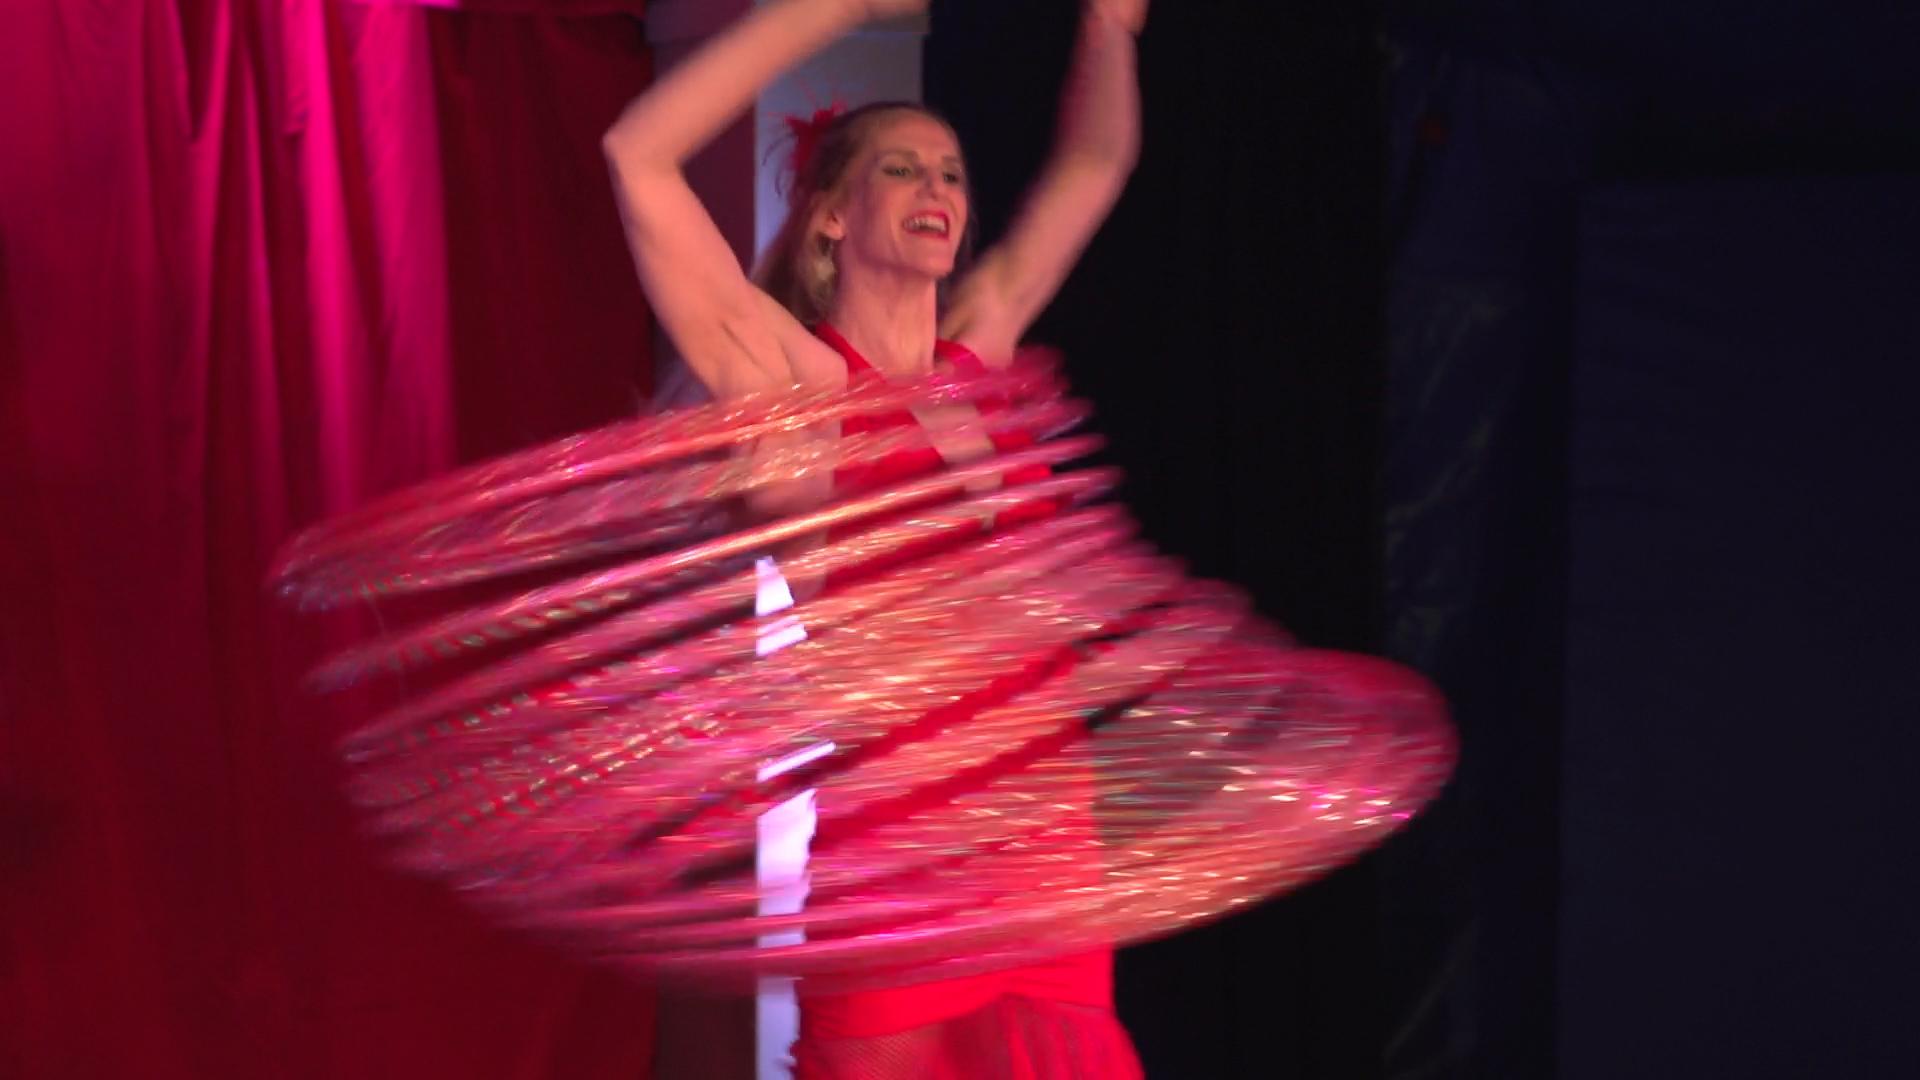 Laura-Cohen-Hula-Hoop-Show-circusevents-koeln-5